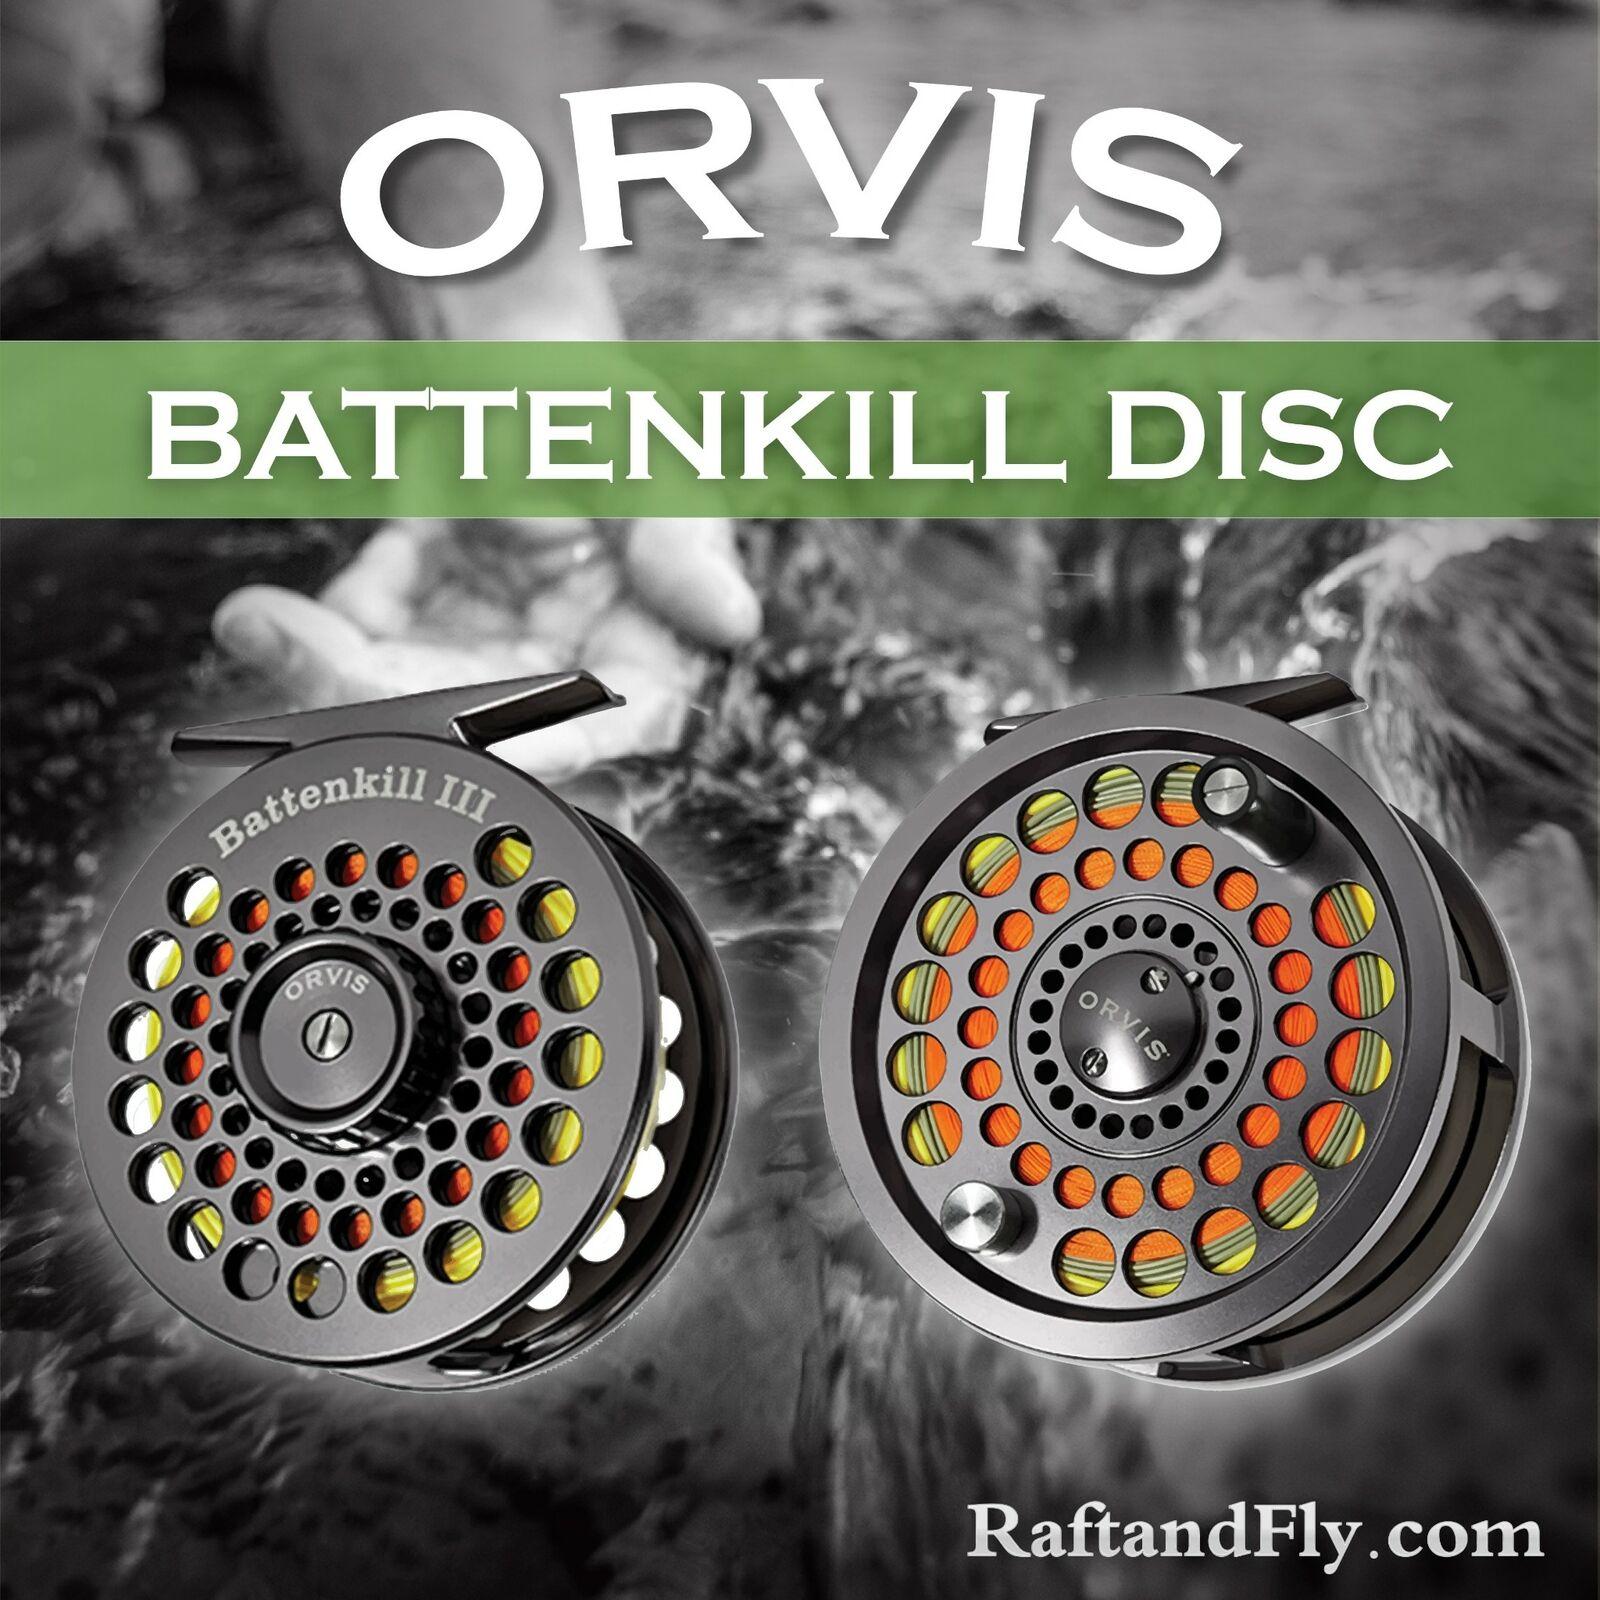 Orvis Battenkill Disc IV Fly Reel 7-9wt - Free Shipping